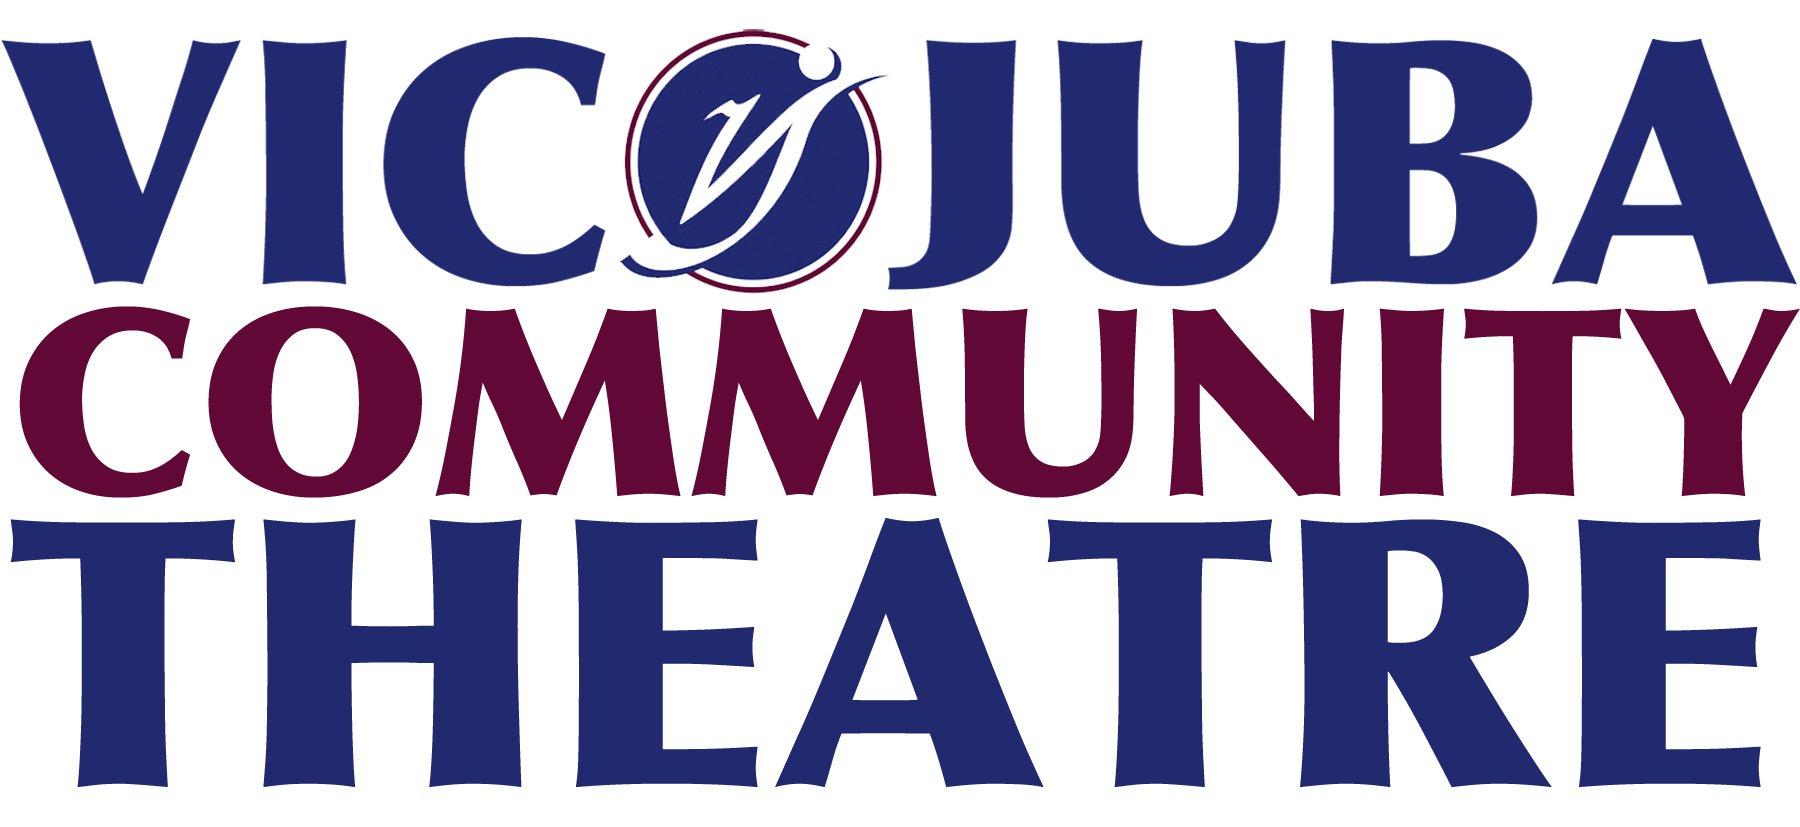 Vic Juba Community Theatre